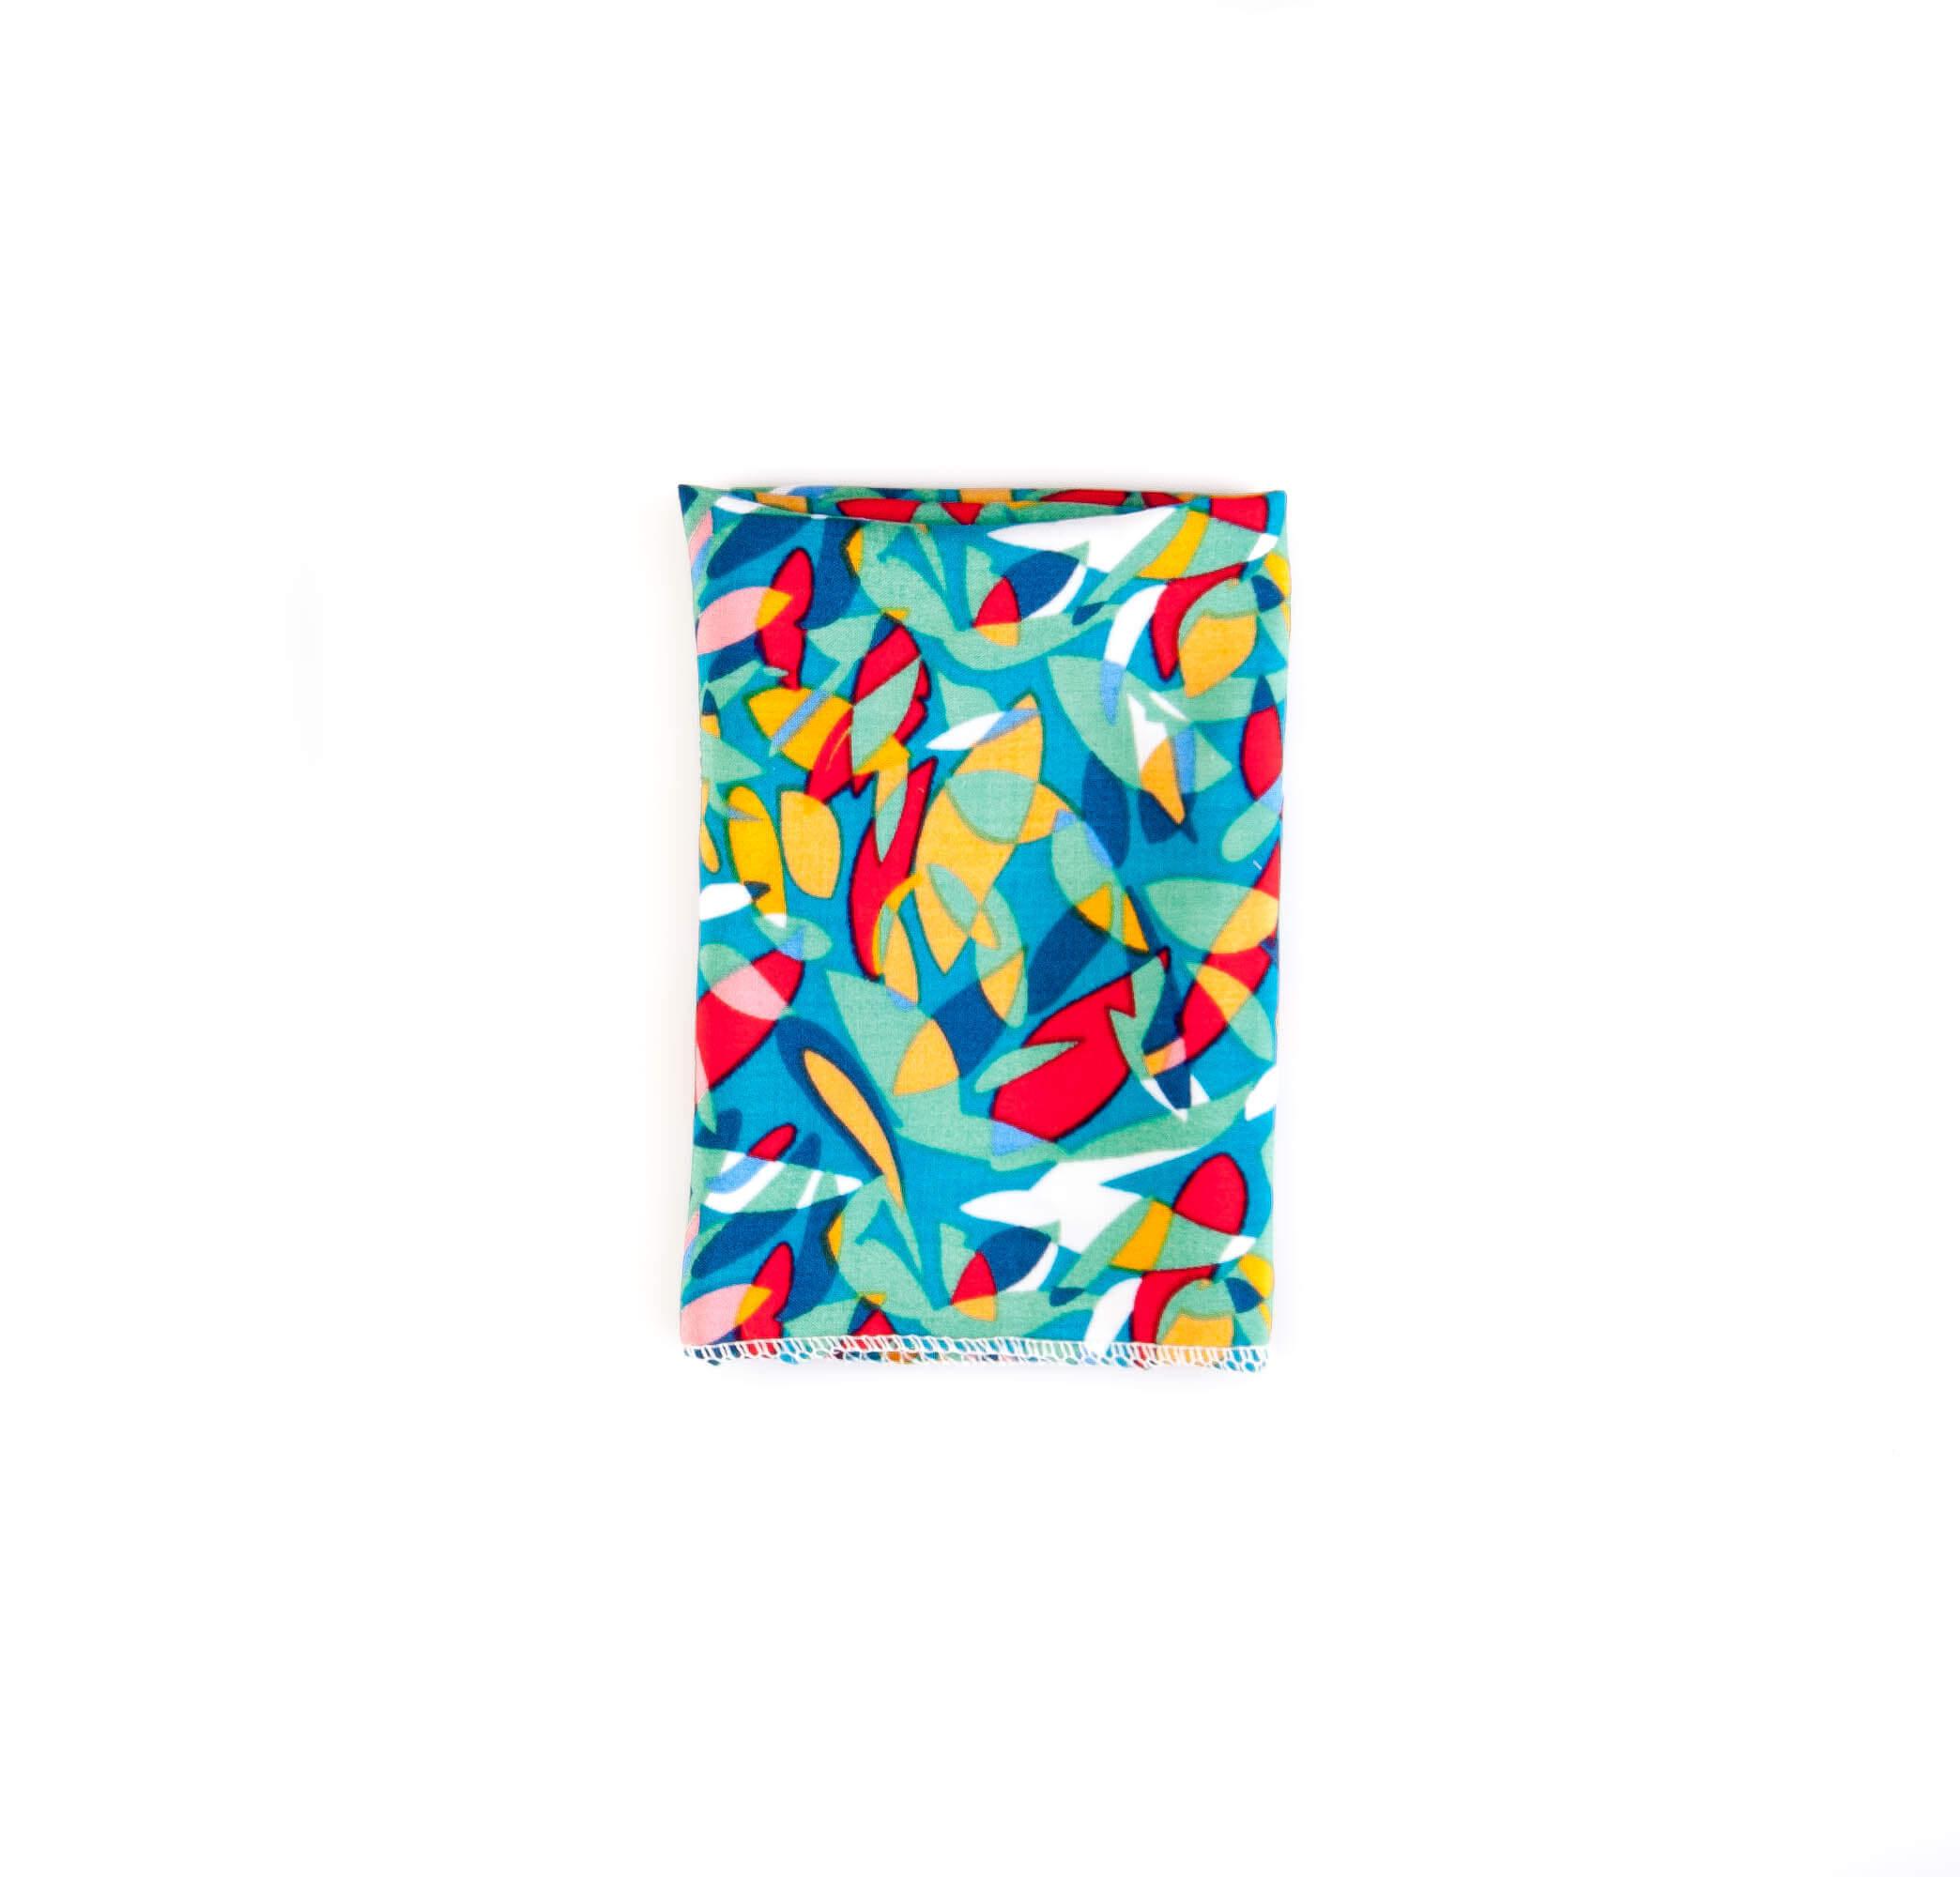 دستمال جیب طرح مدرن رنگی کد PS1051